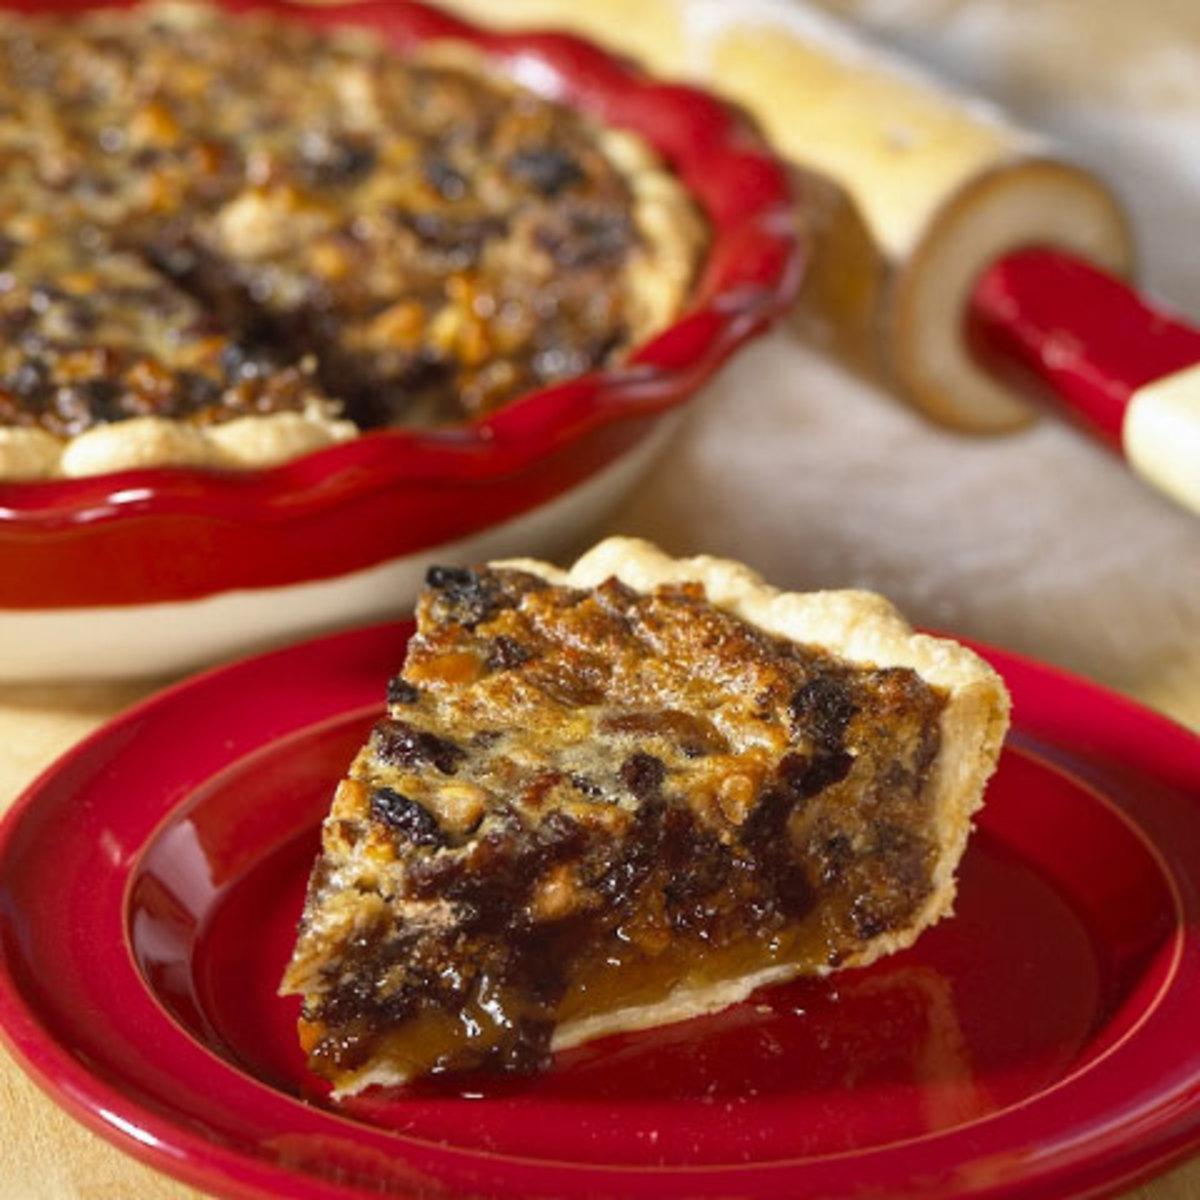 California Raisin and Maple Crunch Pie